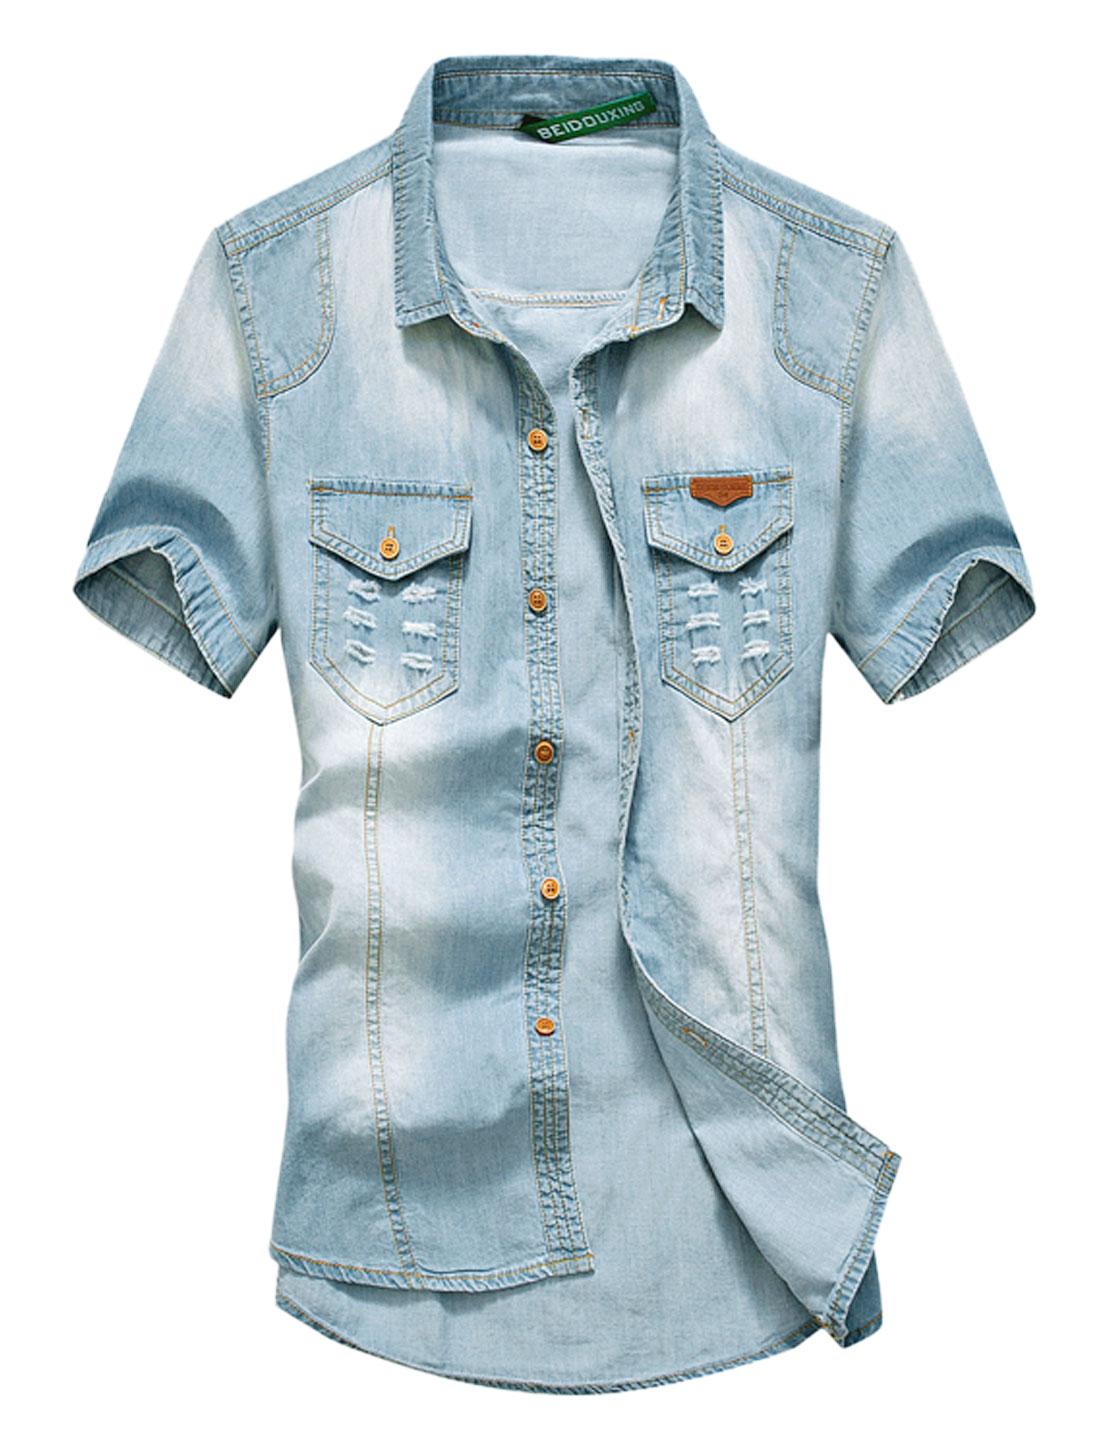 Men Distressed Detail Point Collar Casual Denim Shirt Light Blues S